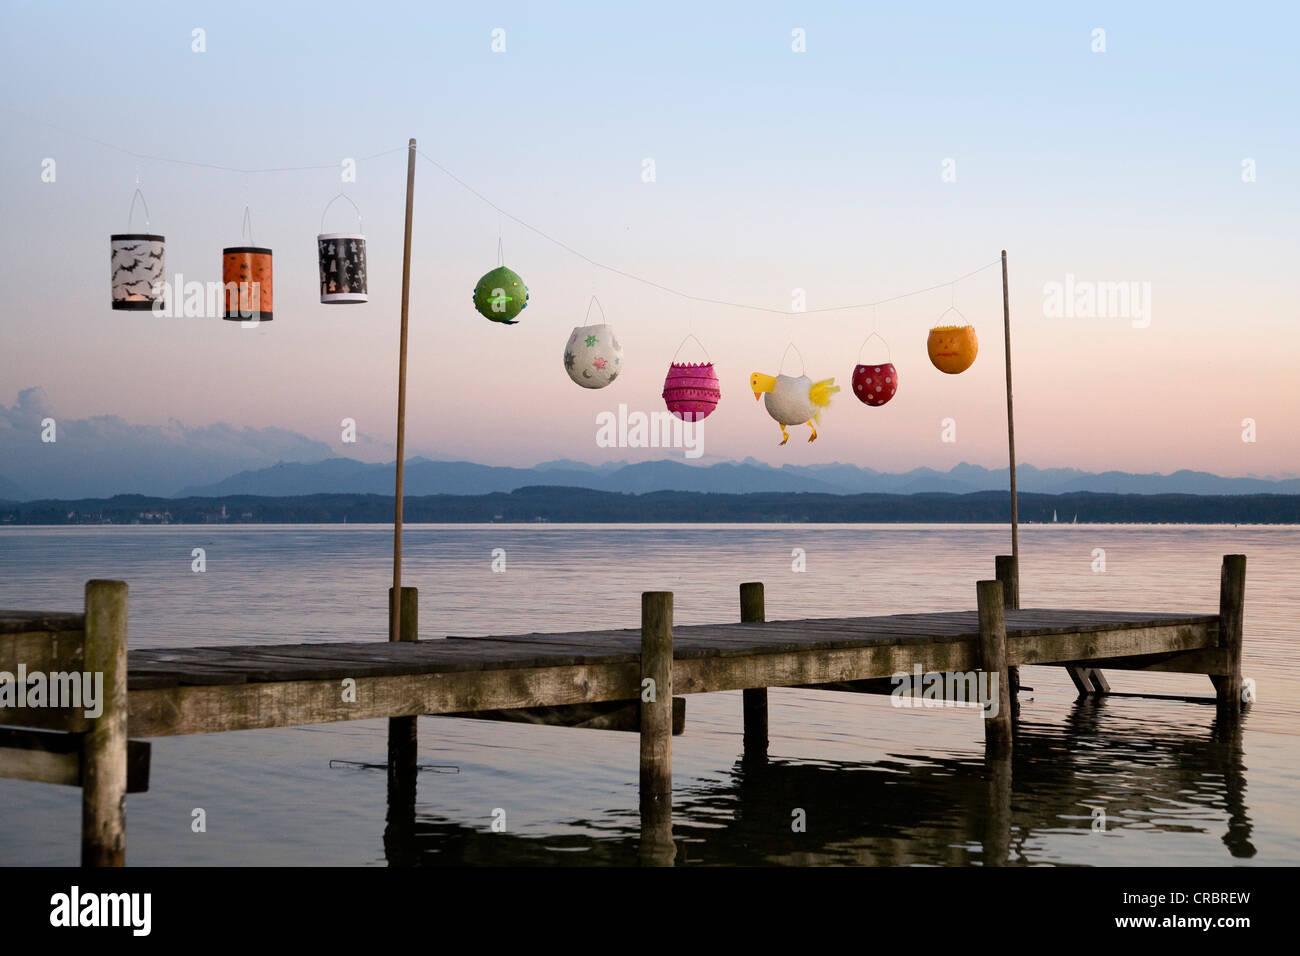 Paper lanterns strung up on wooden pier - Stock Image